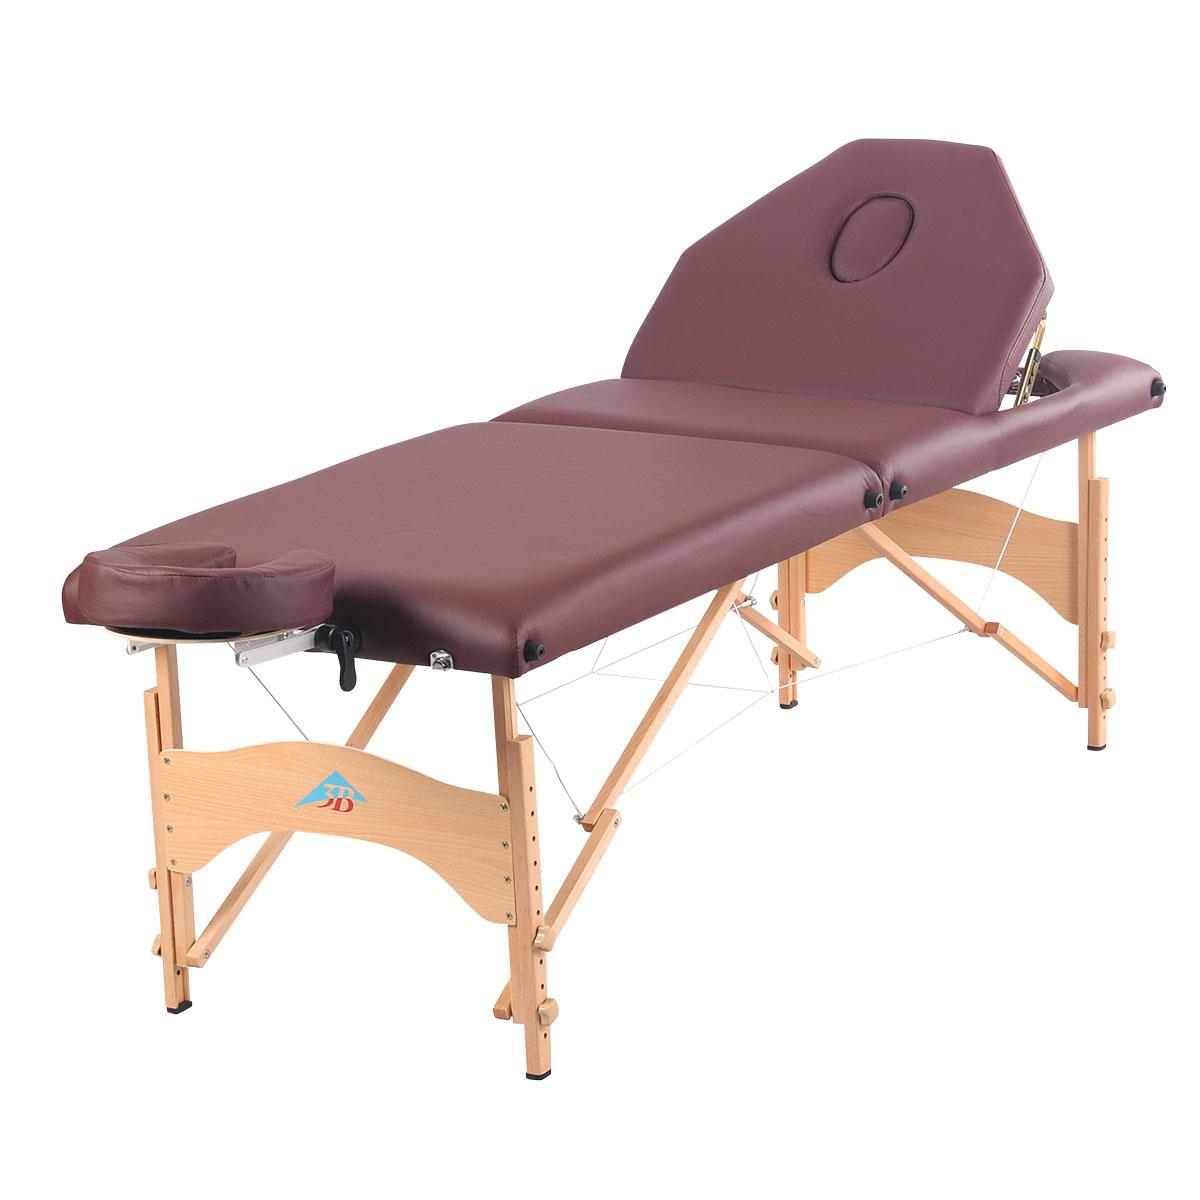 3b Liftback Portable Massage Table Burgundy 3b